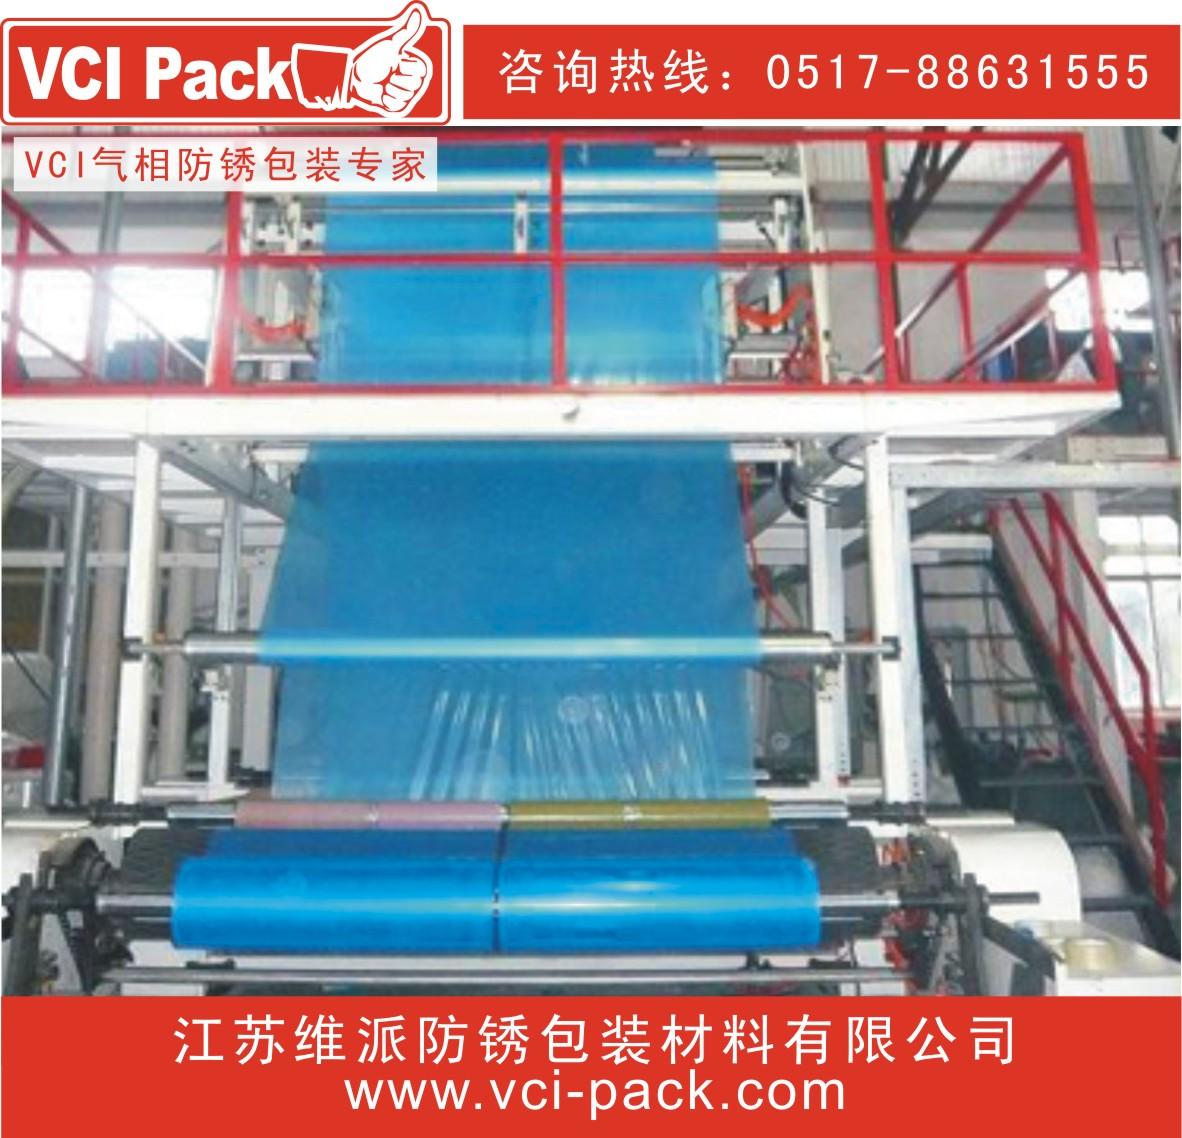 VCI防锈膜-气相防锈膜-气象防锈膜-气化性防锈膜-出口海运专用防锈膜